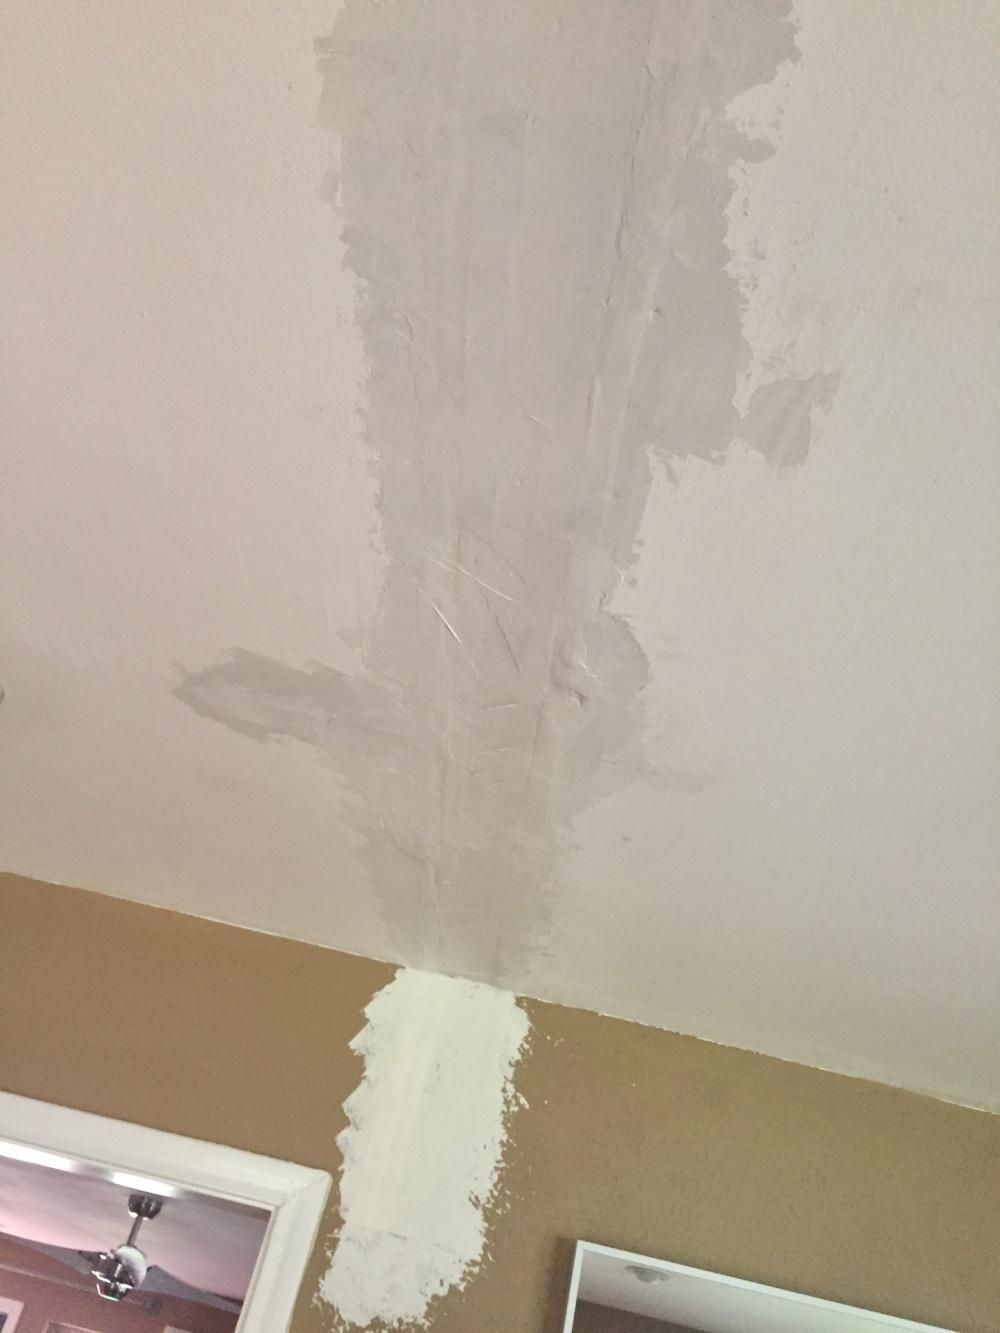 Repairing the Ceiling